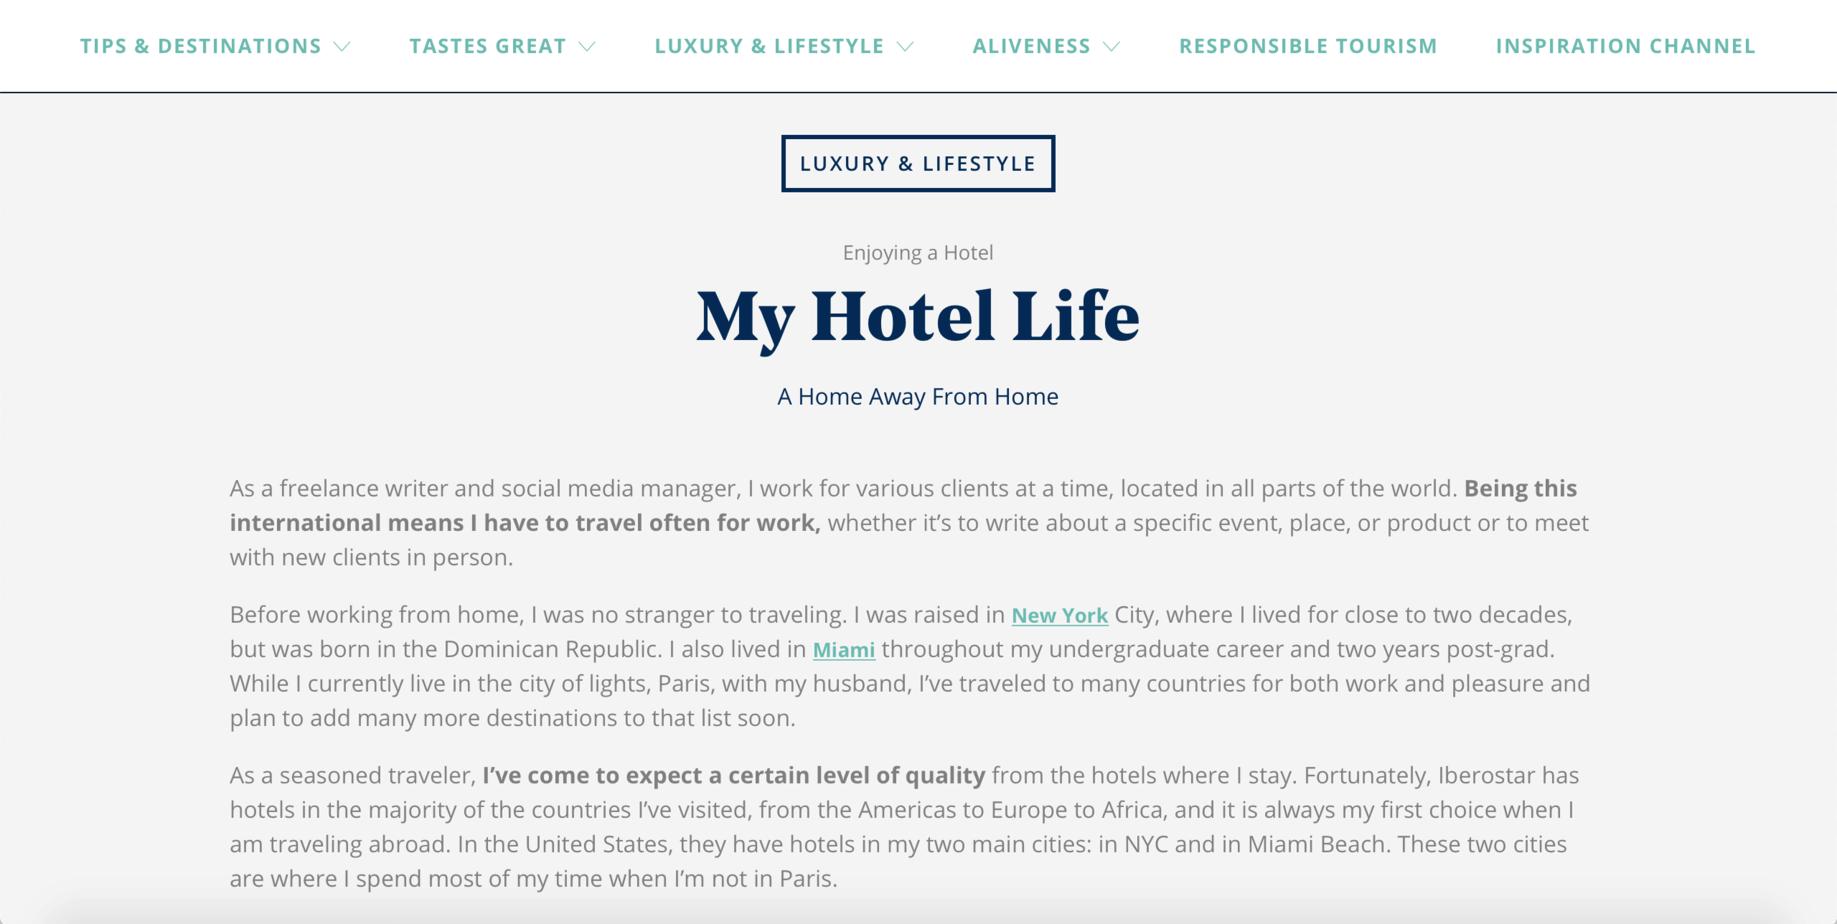 My Hotel Life for Iberostar Inspiration Guide